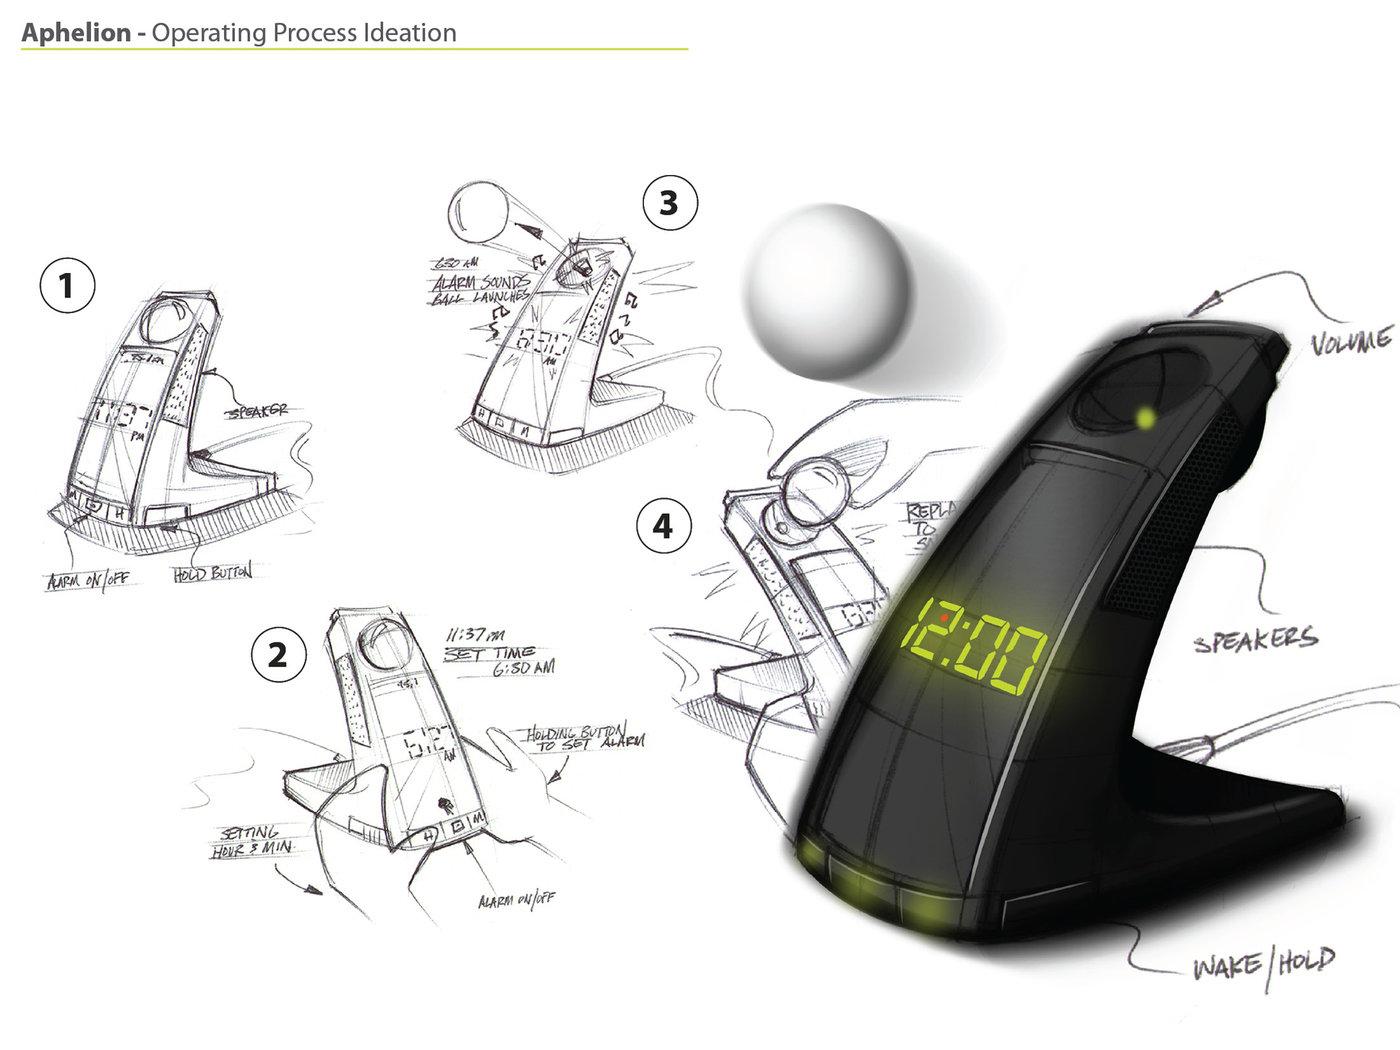 Aphelion Alarm Clock Redesign By Corey Harris At